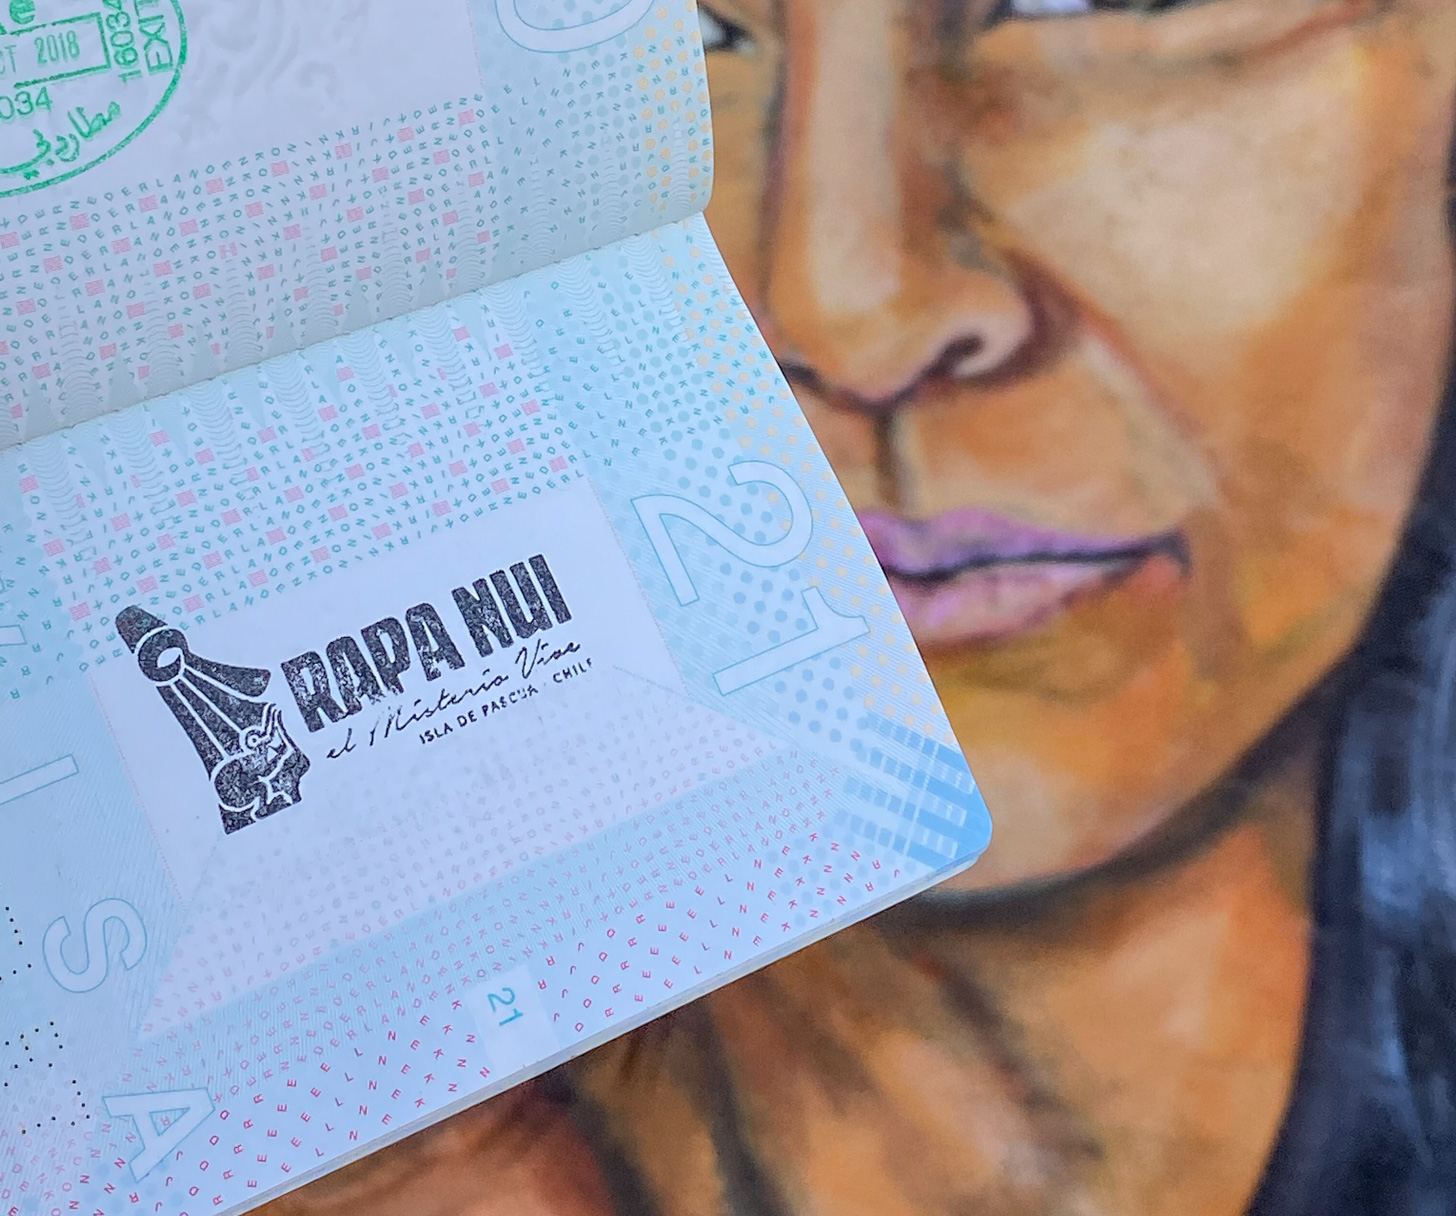 het felbegeerde stempel van Paaseiland in je paspoort